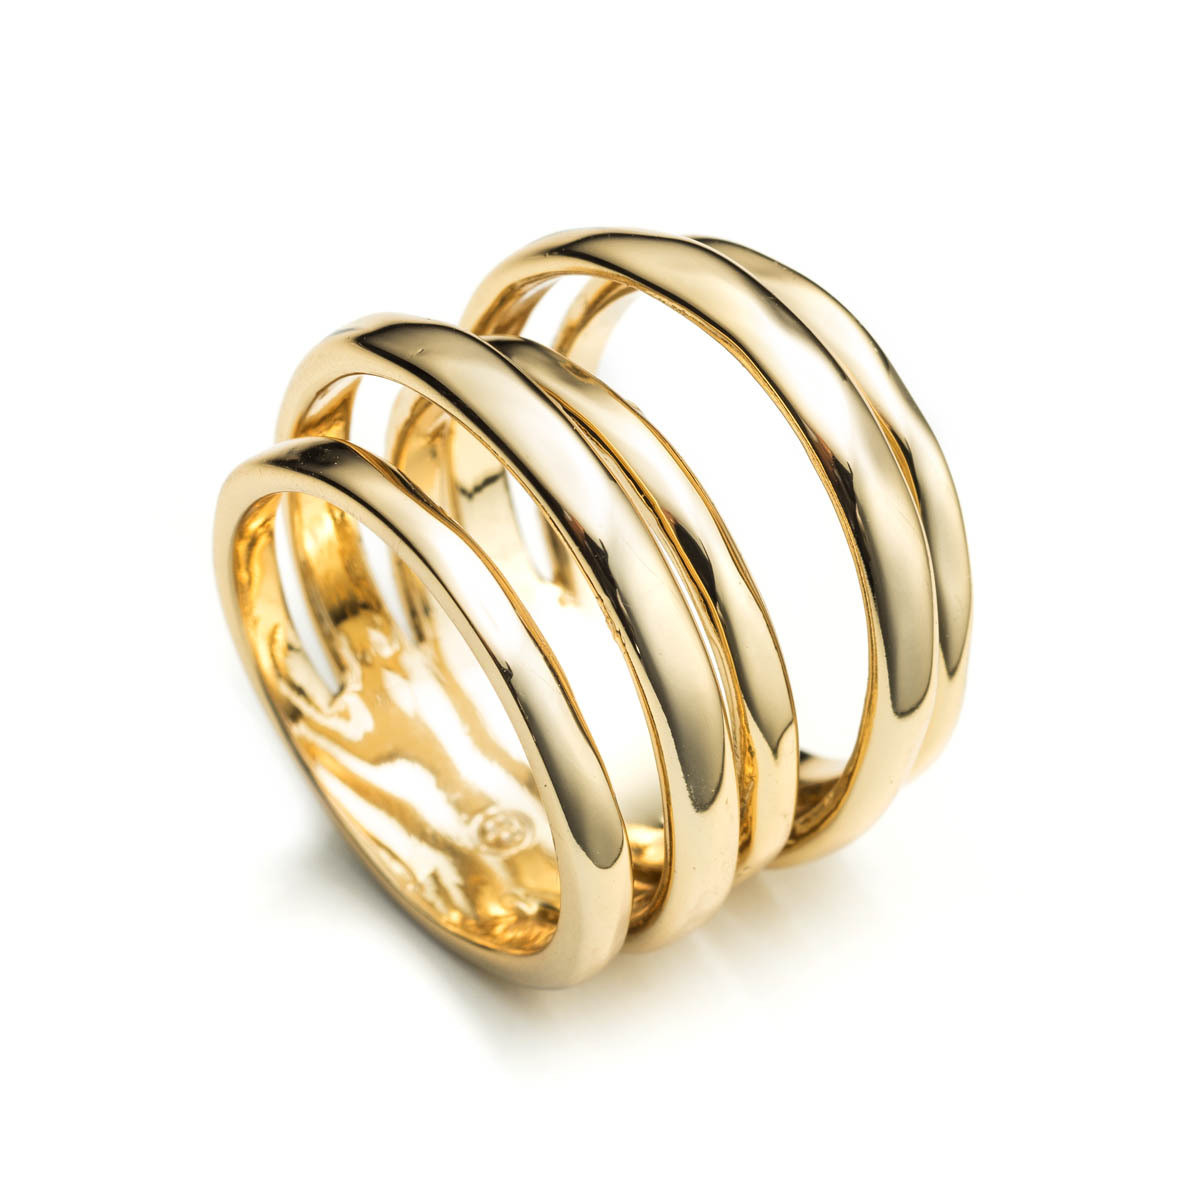 Liquid Gold Layered Ring